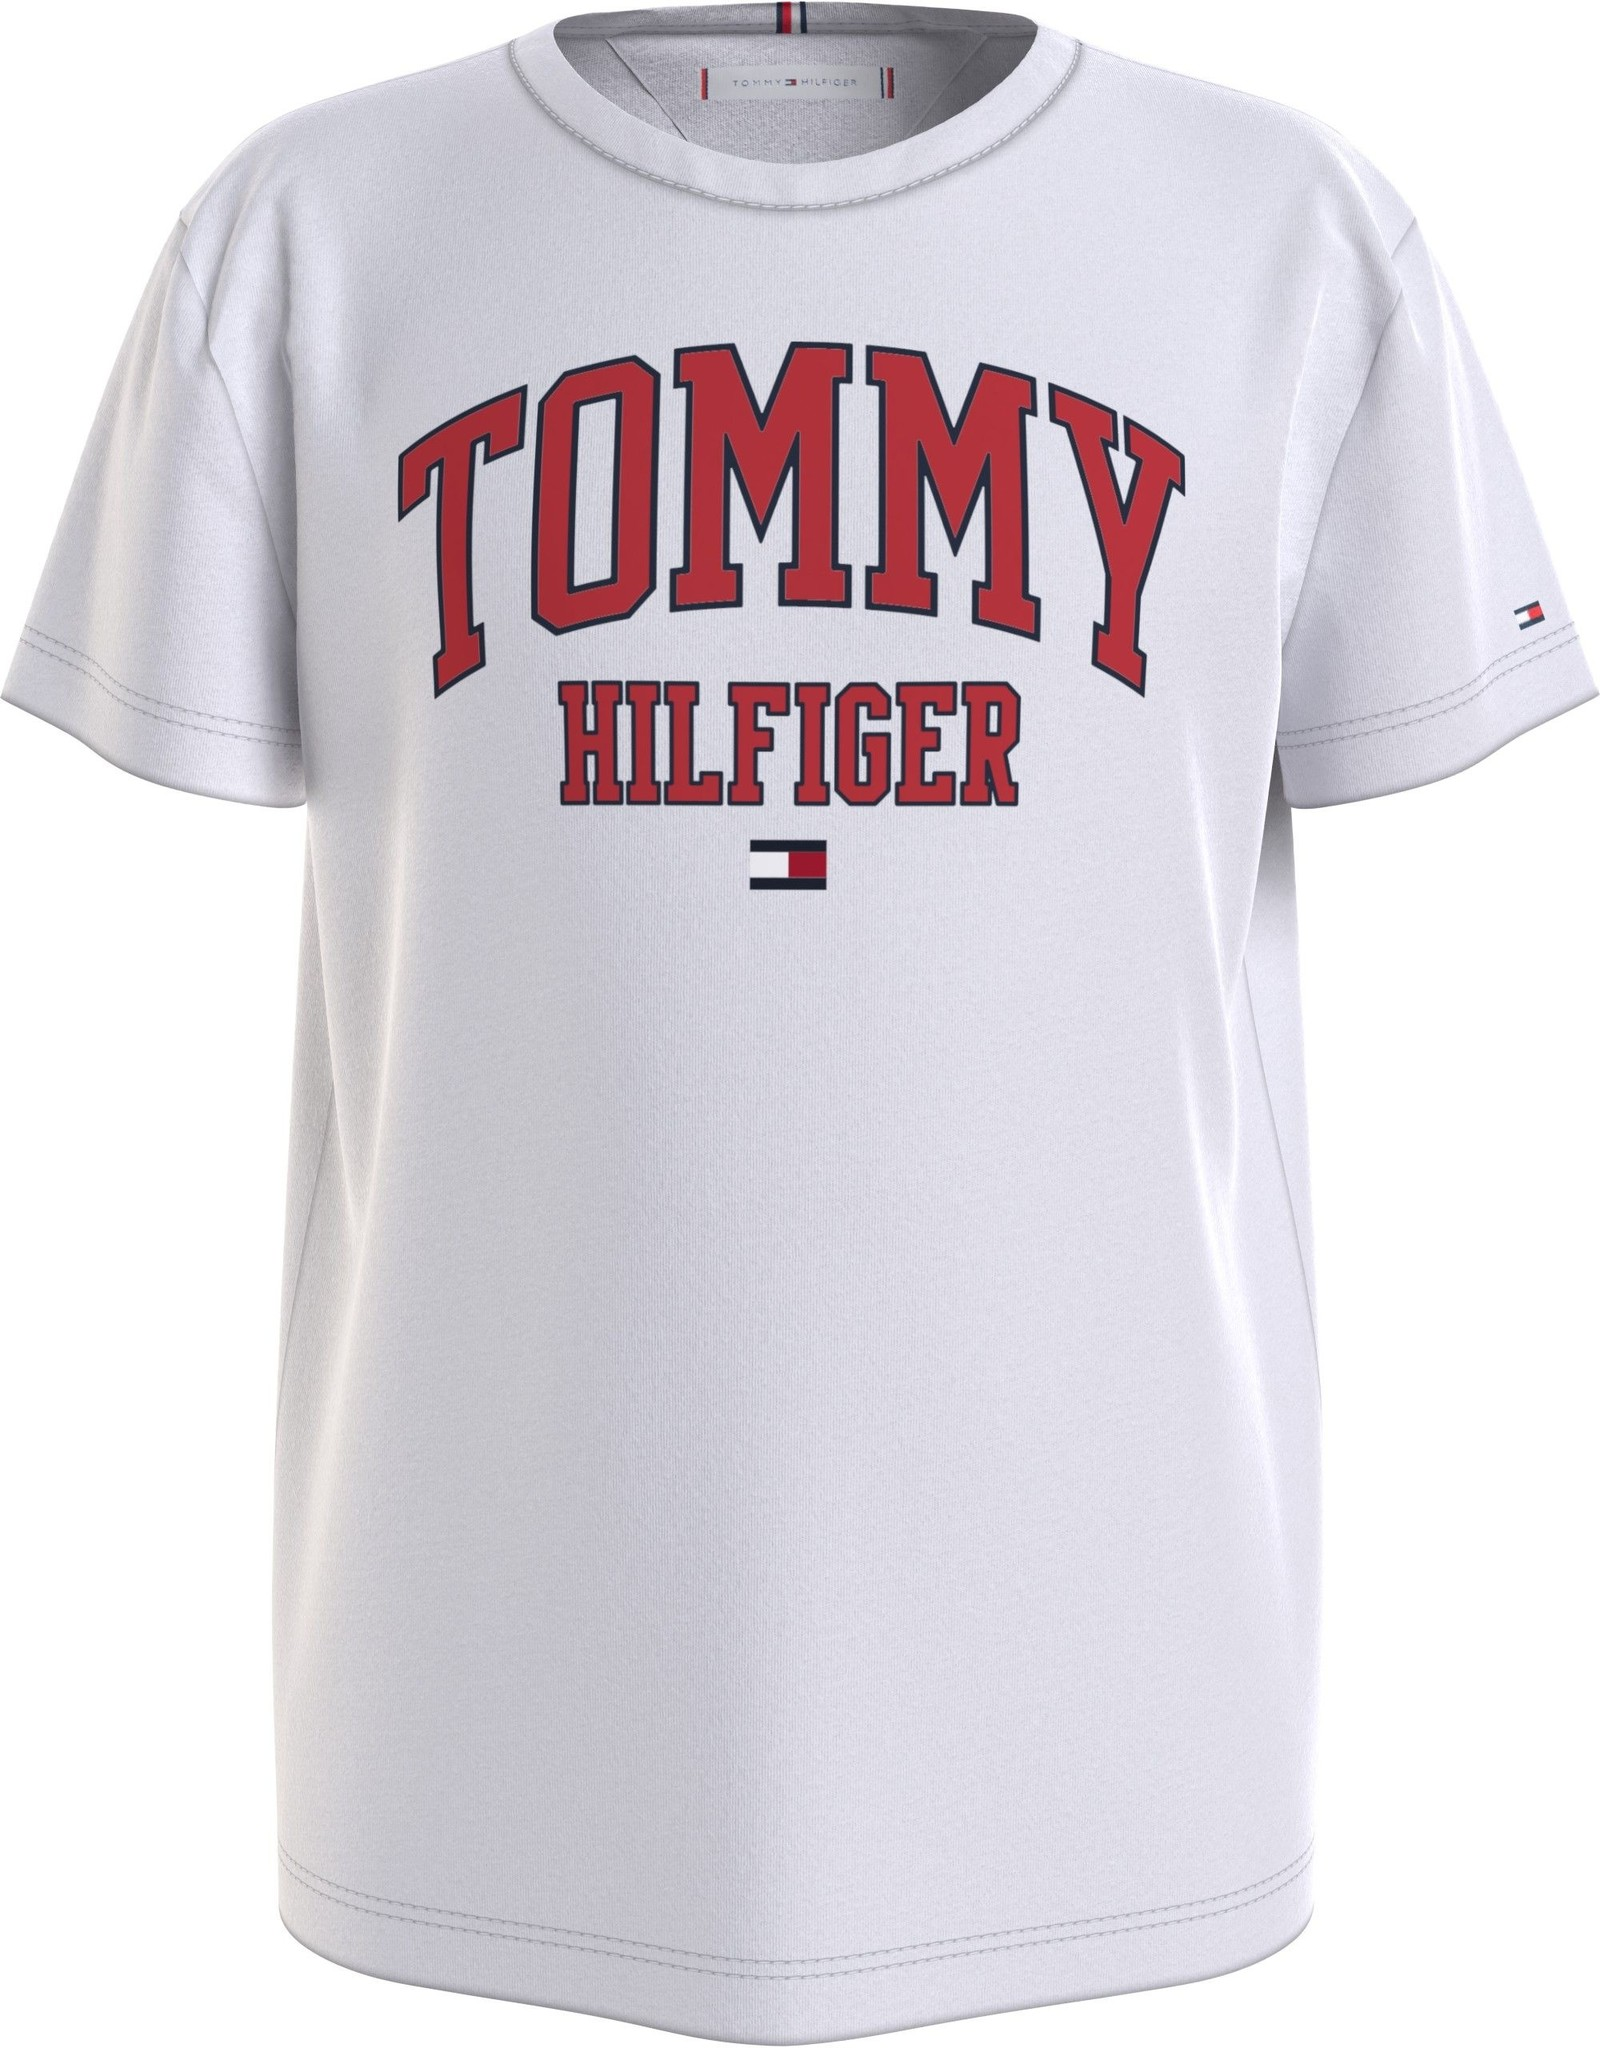 Tommy Hilfiger 5733 T-Shirt